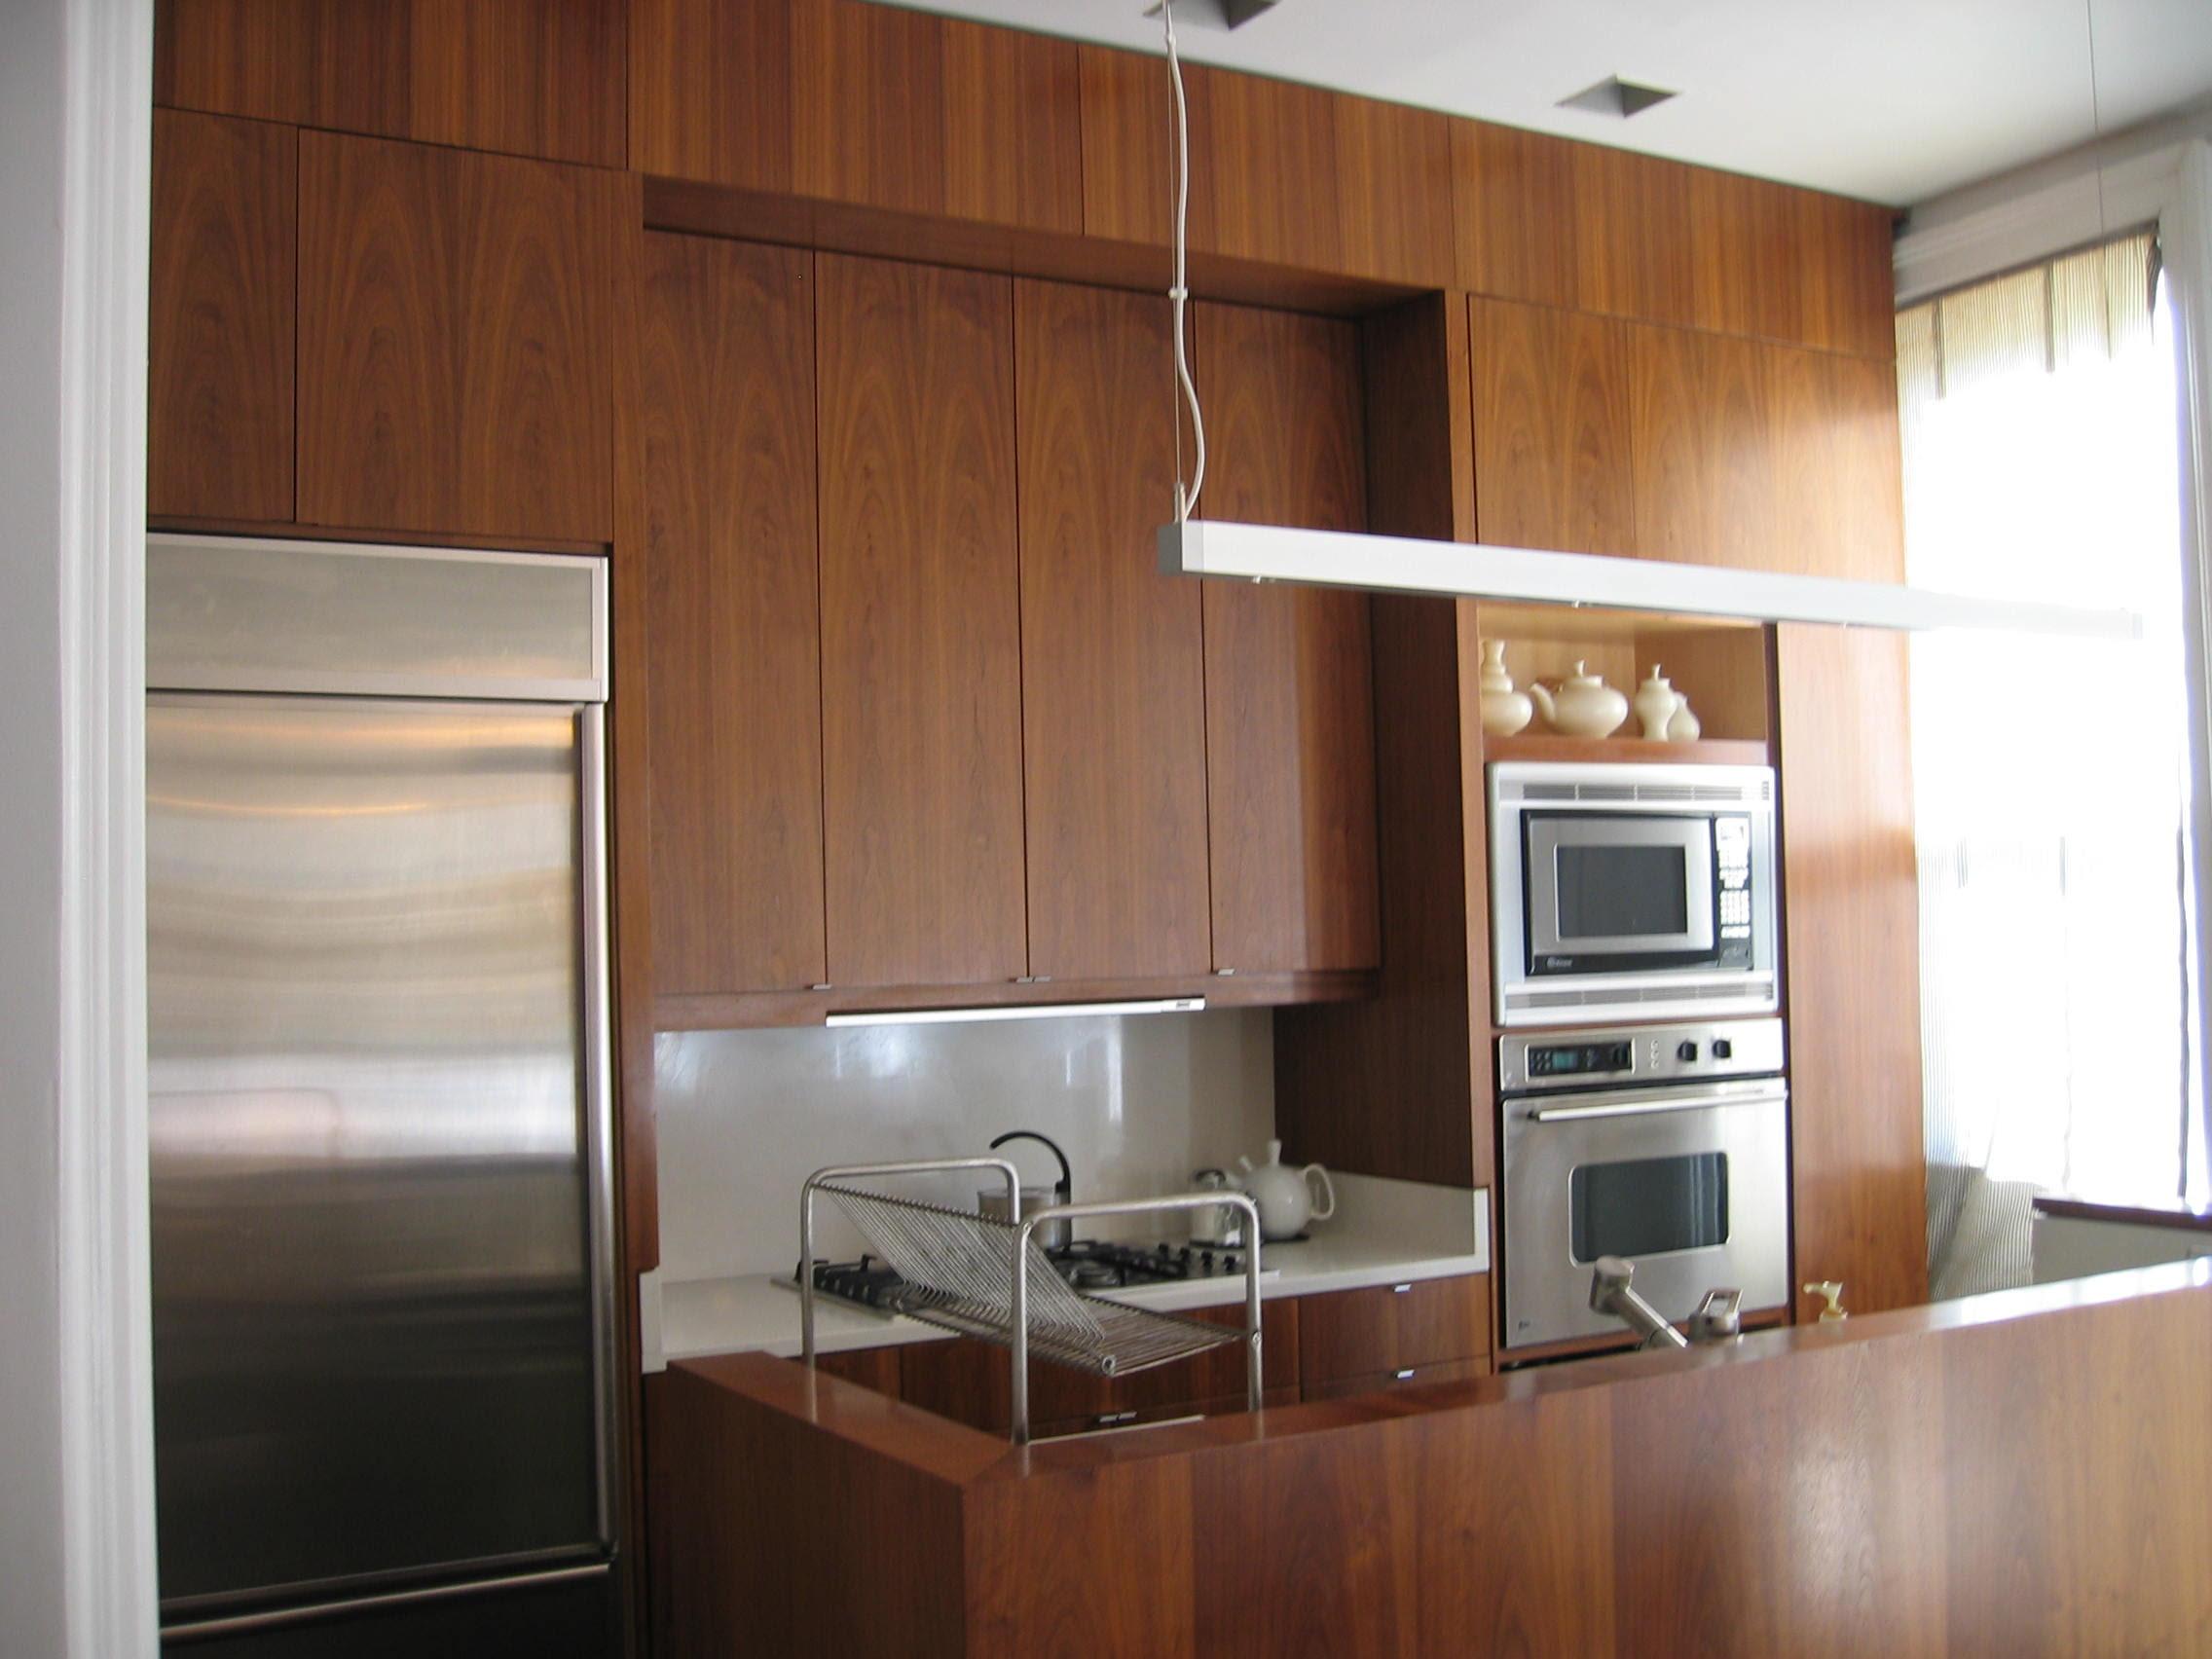 Very Best Small Kitchen Cabinets 2272 x 1704 · 279 kB · jpeg